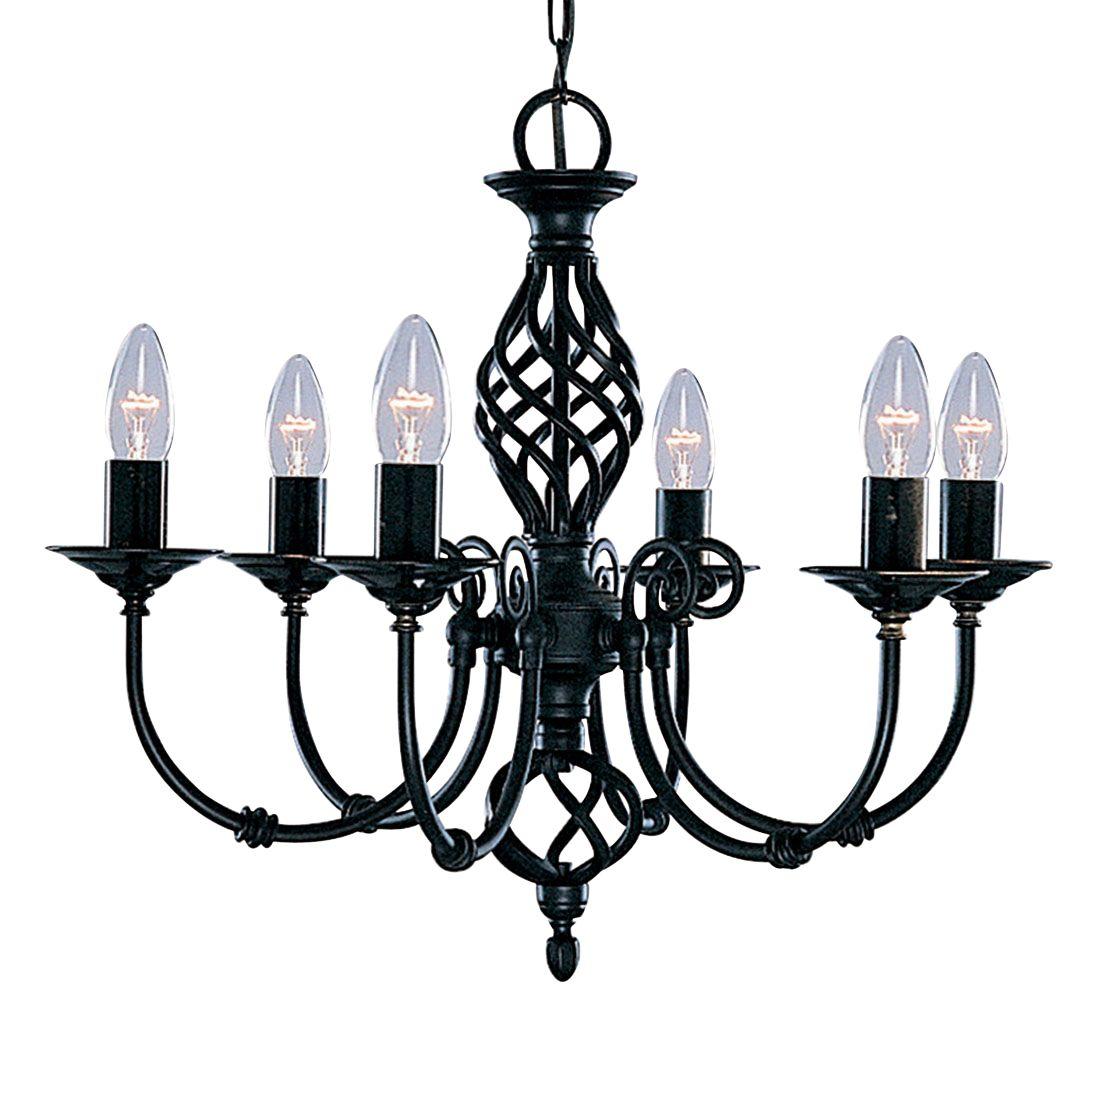 Zanzibar Metal Black 6 Light Fitting With Ornate Twisted Column